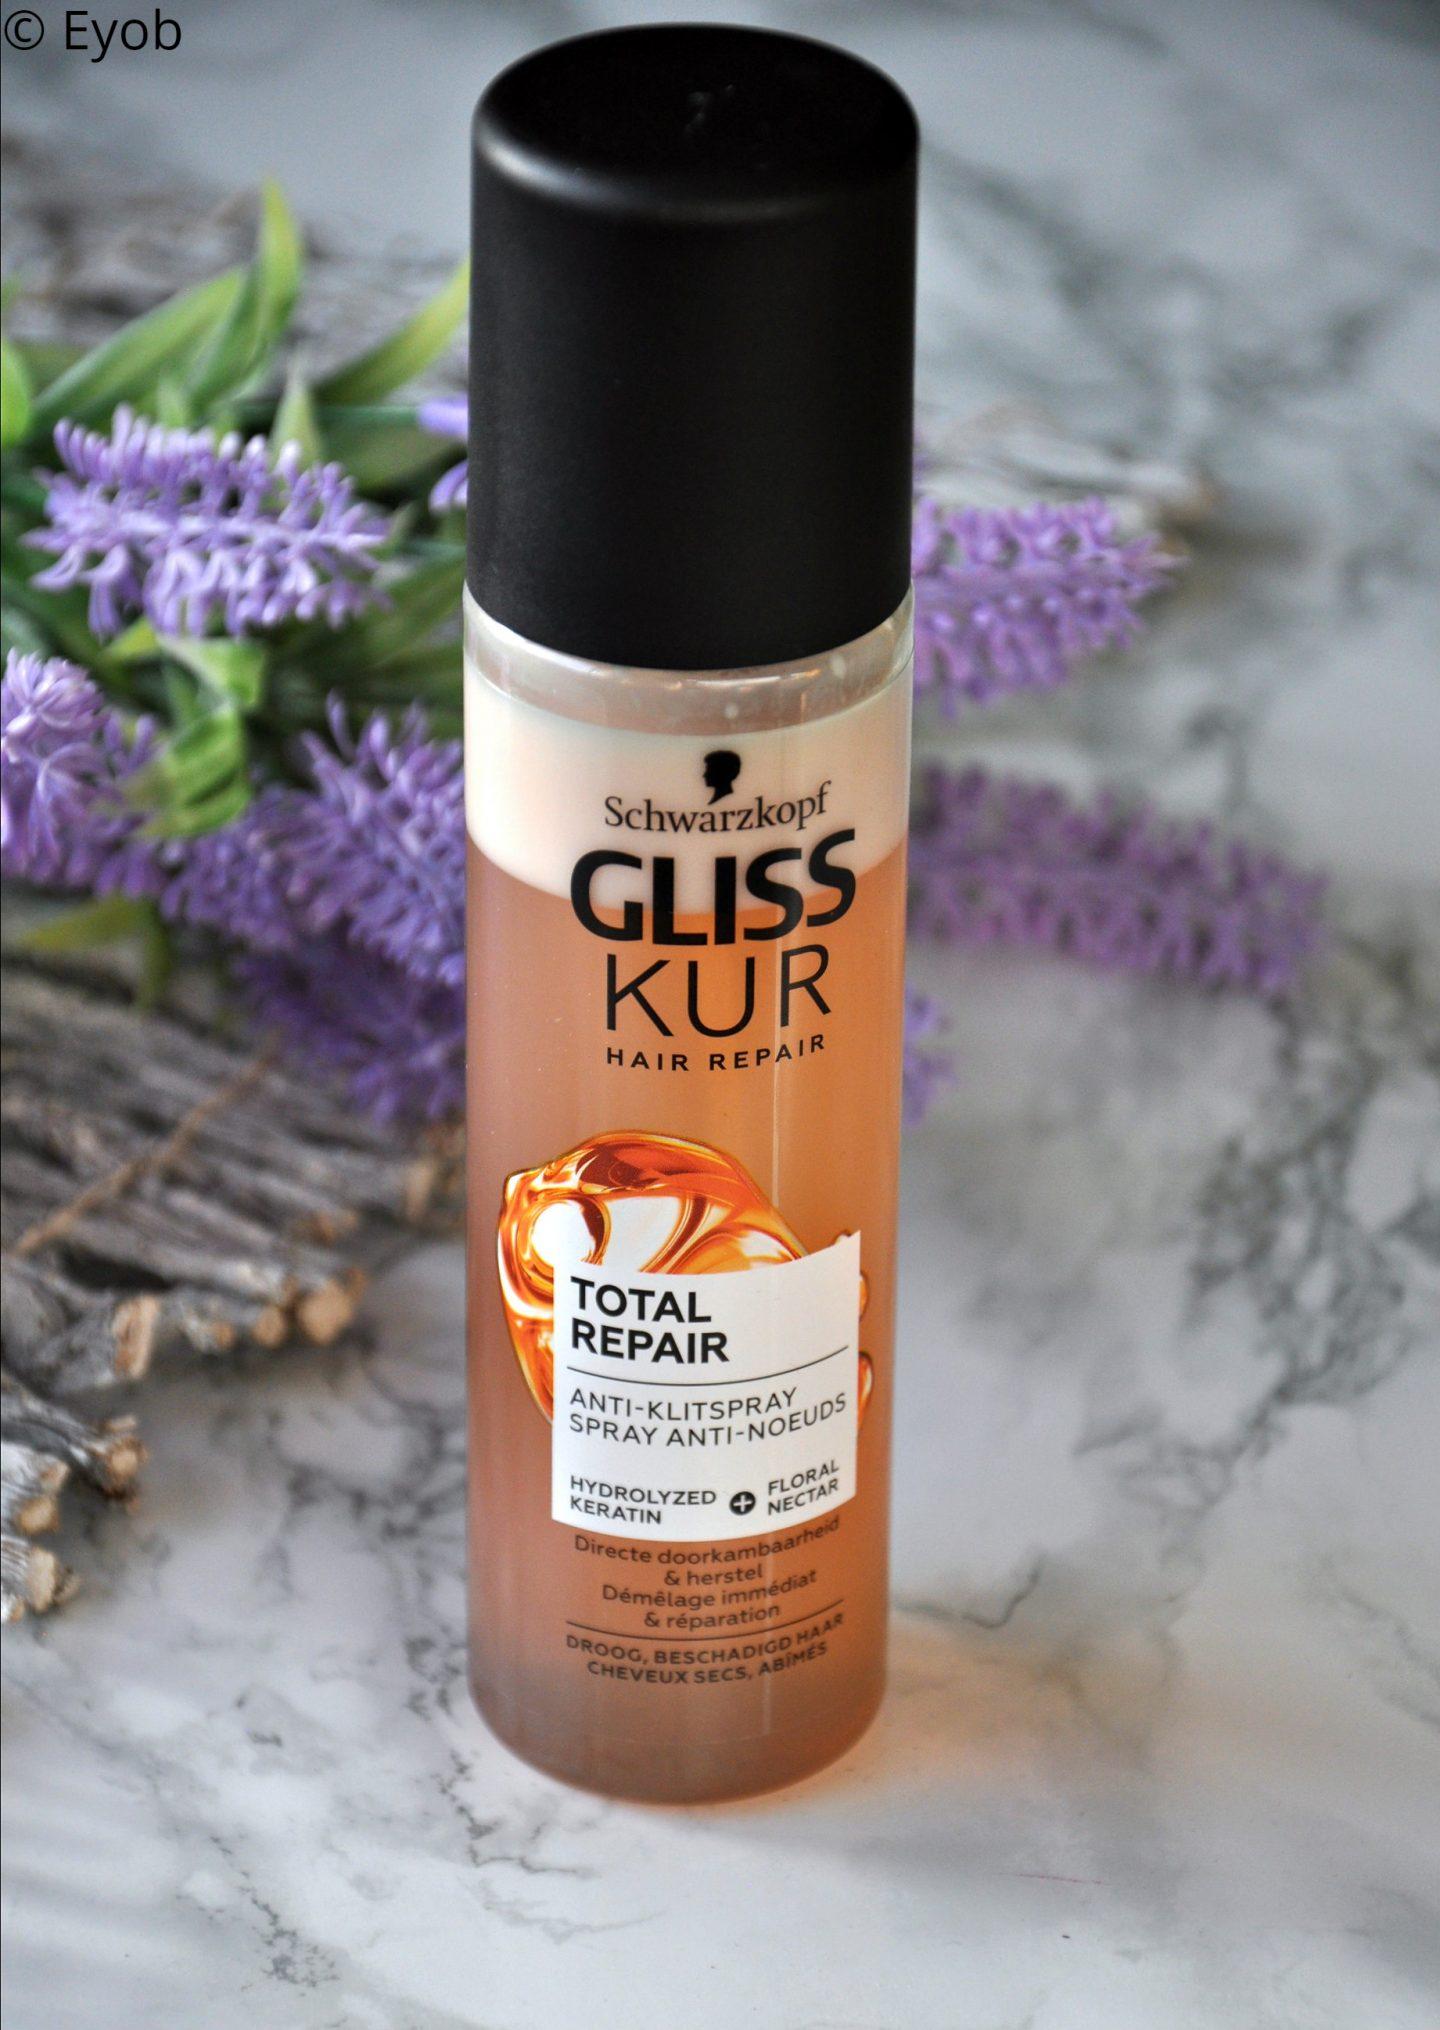 Gliss Kur Anti-Klit Spray